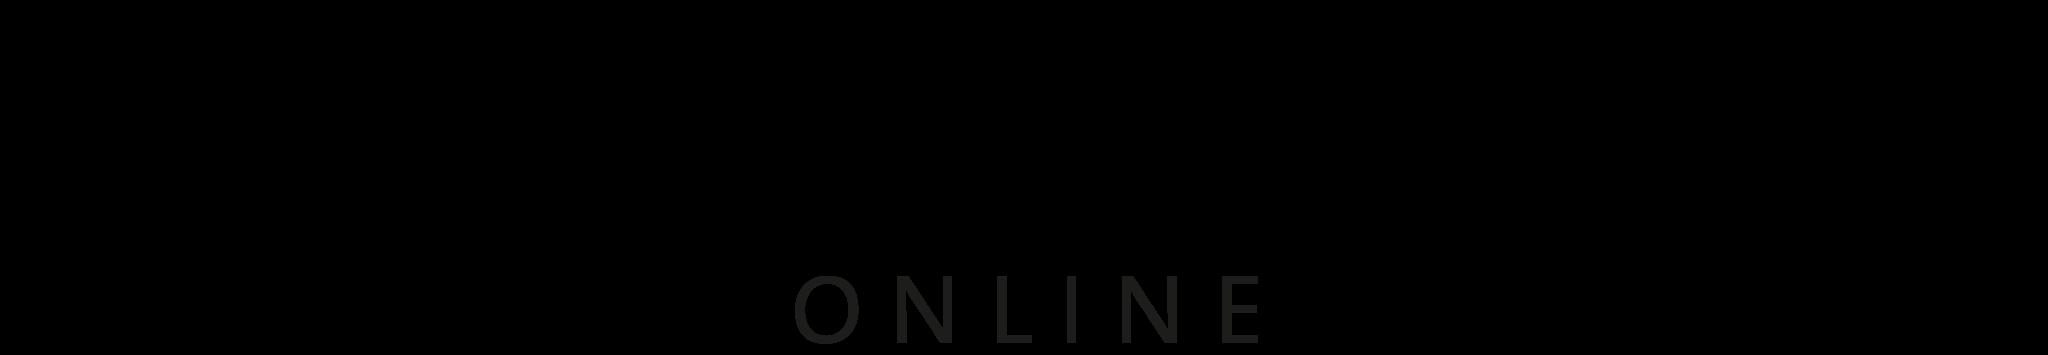 Pearl Brands Online